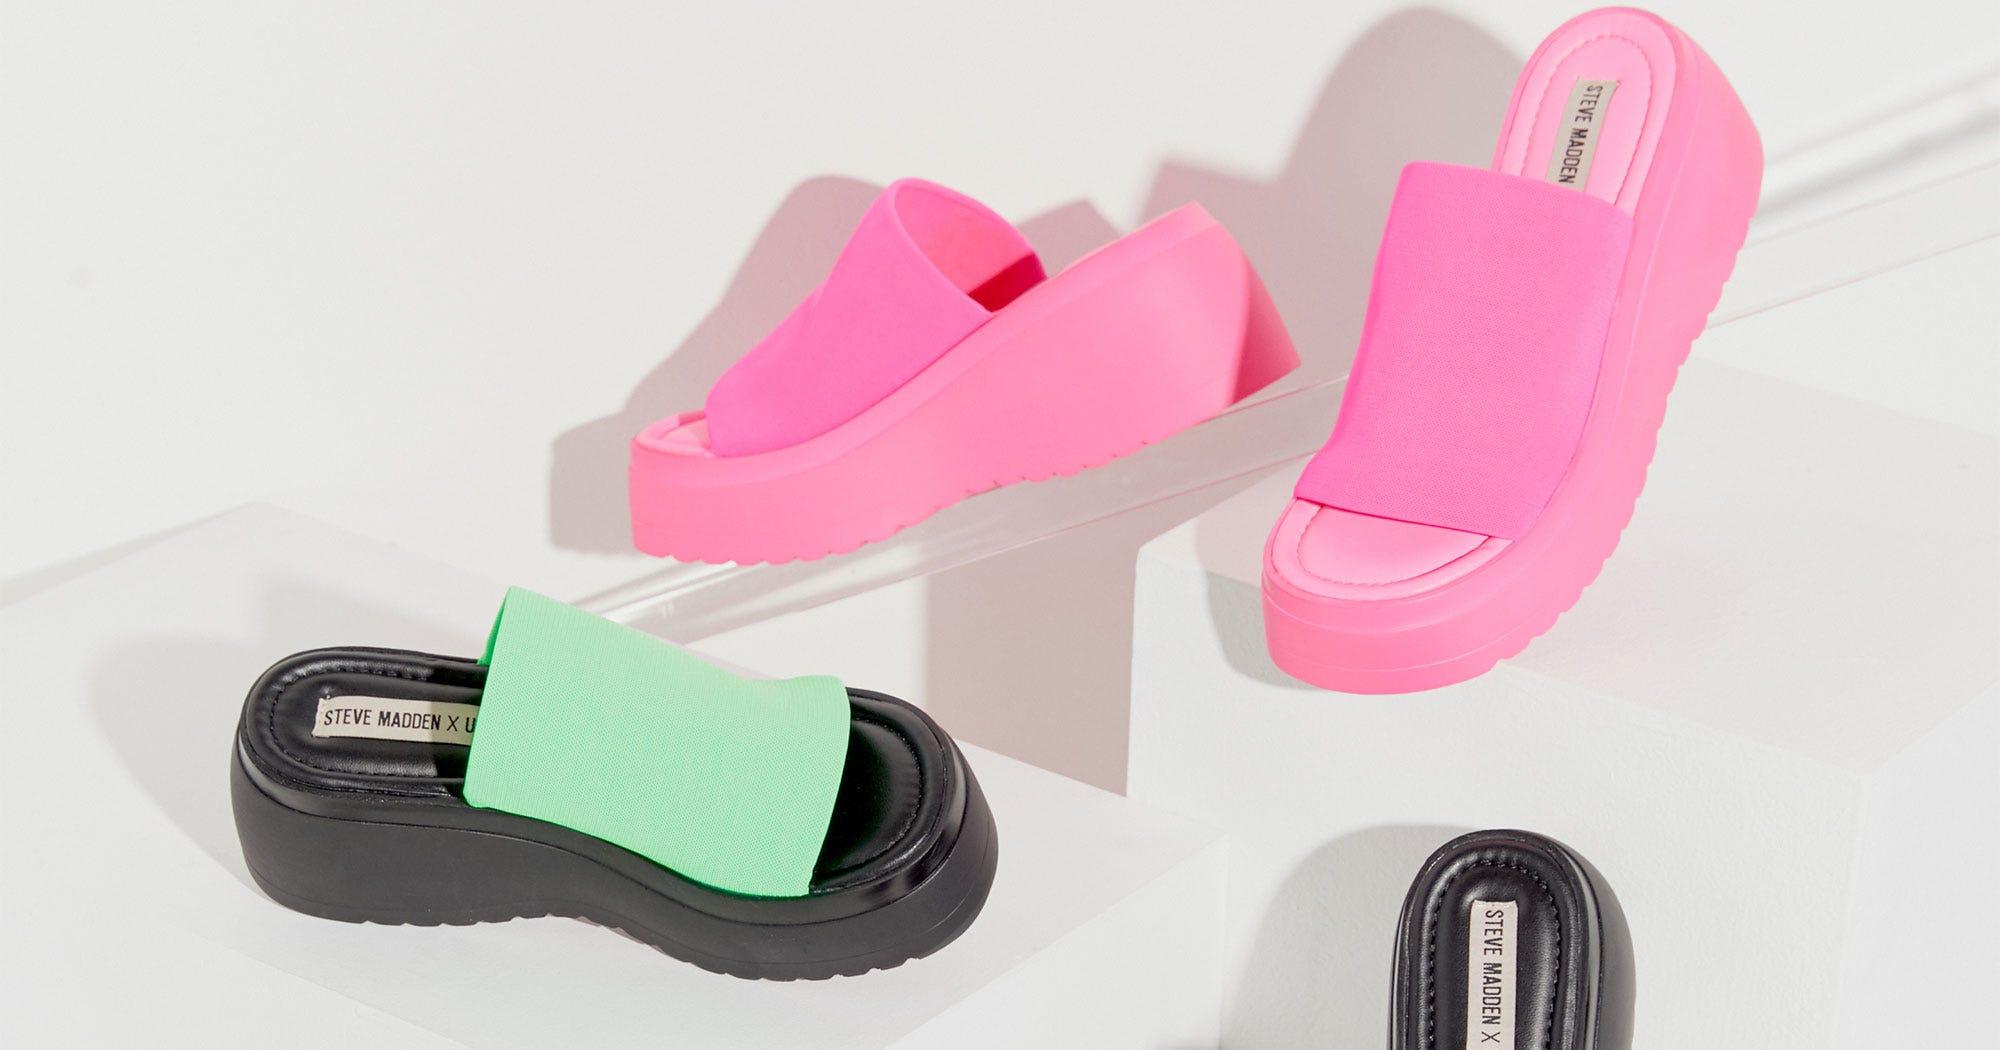 ea4fefd66c8d Steve Madden X Urban Outfitters 90s Platform Sandals